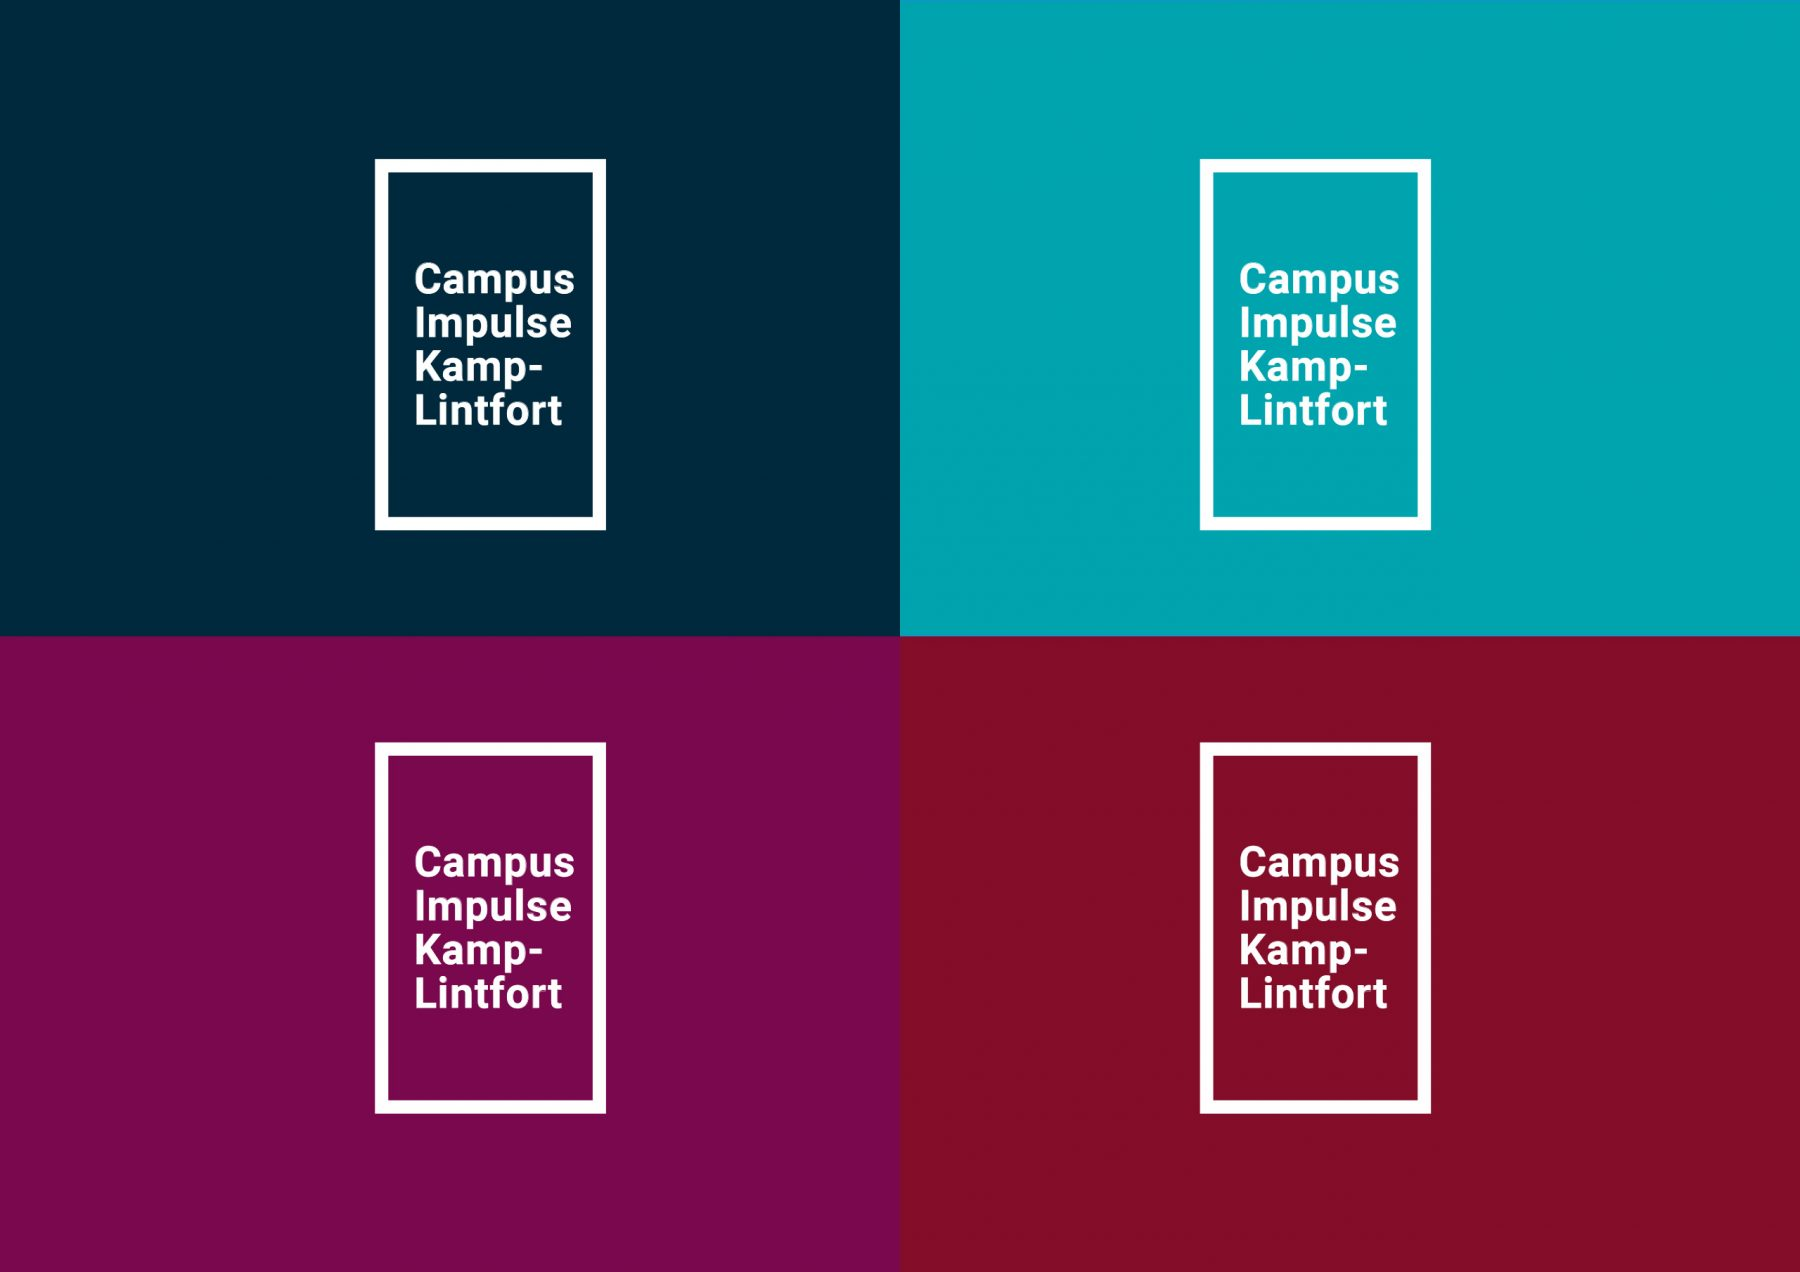 Robin Hill Campus Impulse Logo Colors